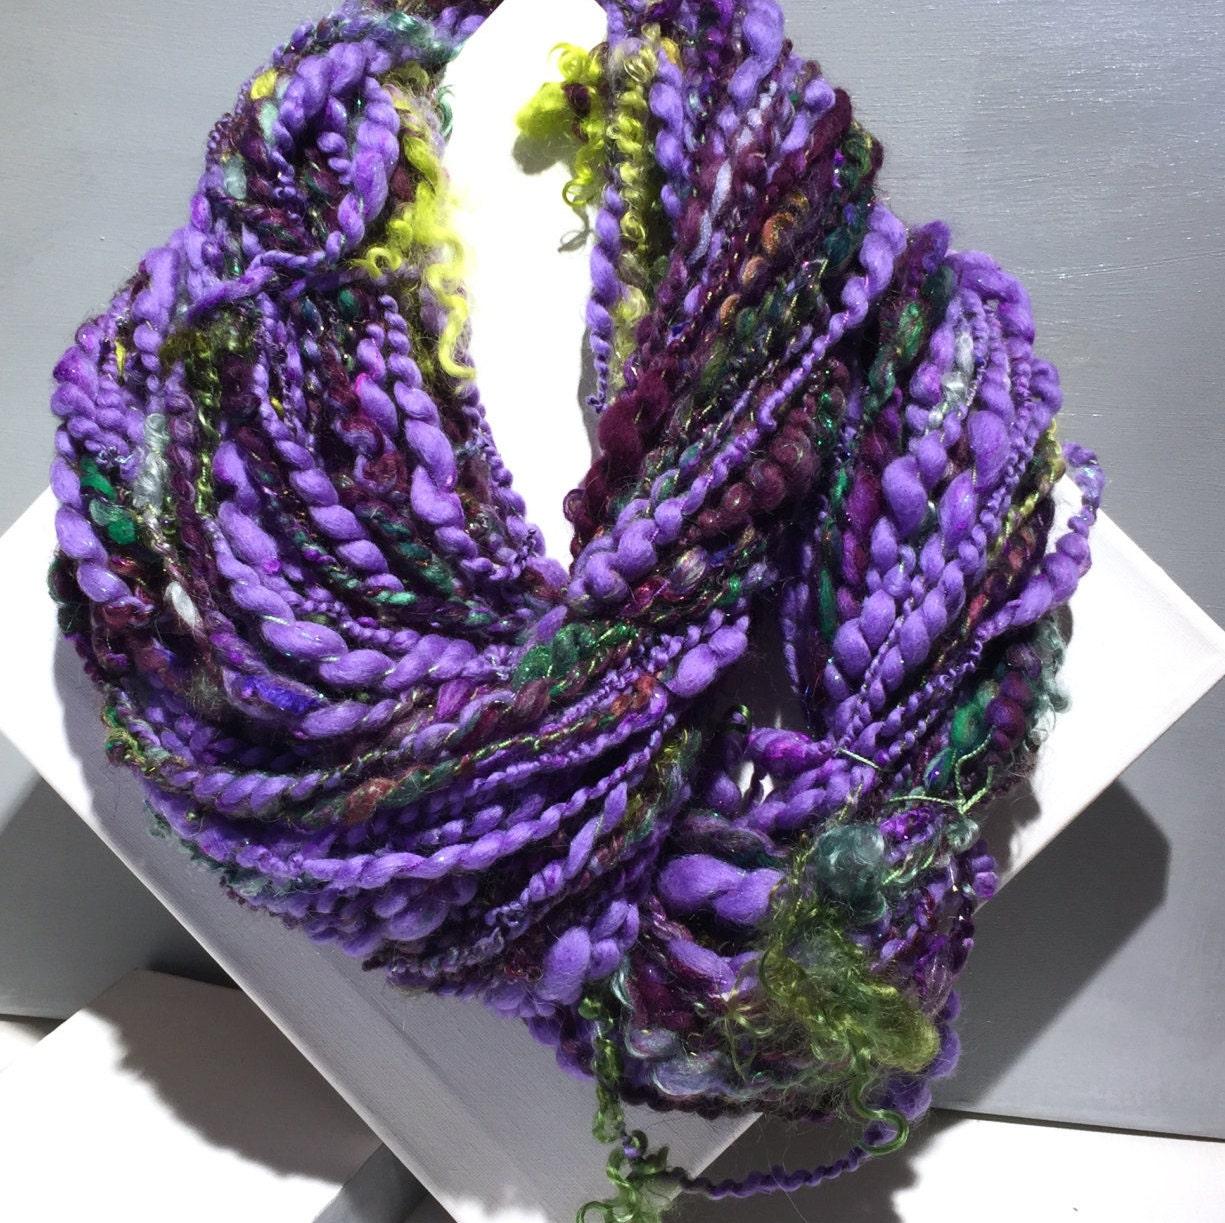 handspun art yarn club wilde garden yarn club thick and thin super bulky art yarn free ship us big knitting crochet saori weaving yarn - Wilde Garden